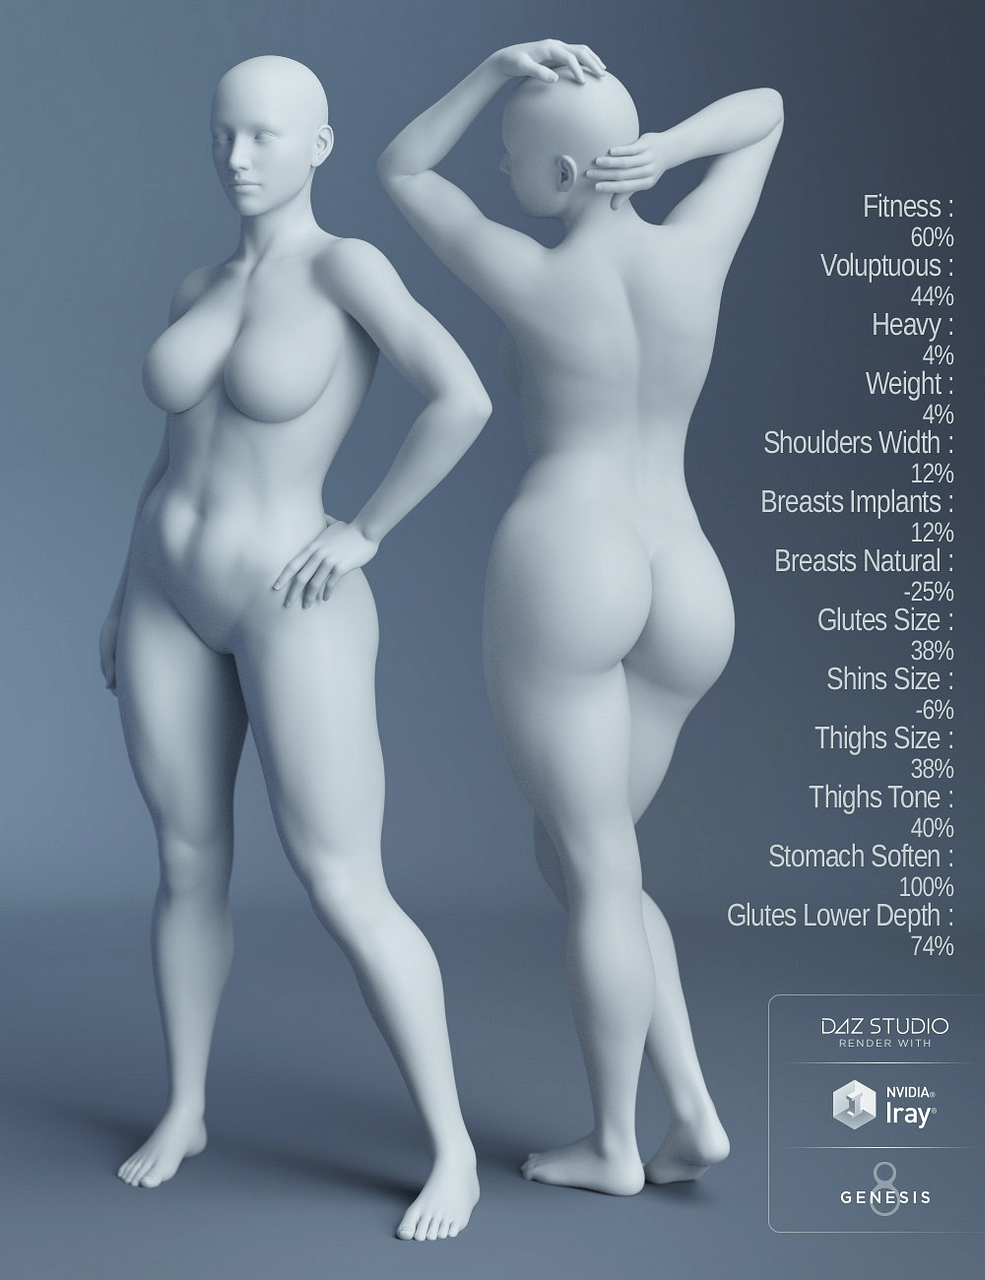 daz3d genesis 8 female body morphs